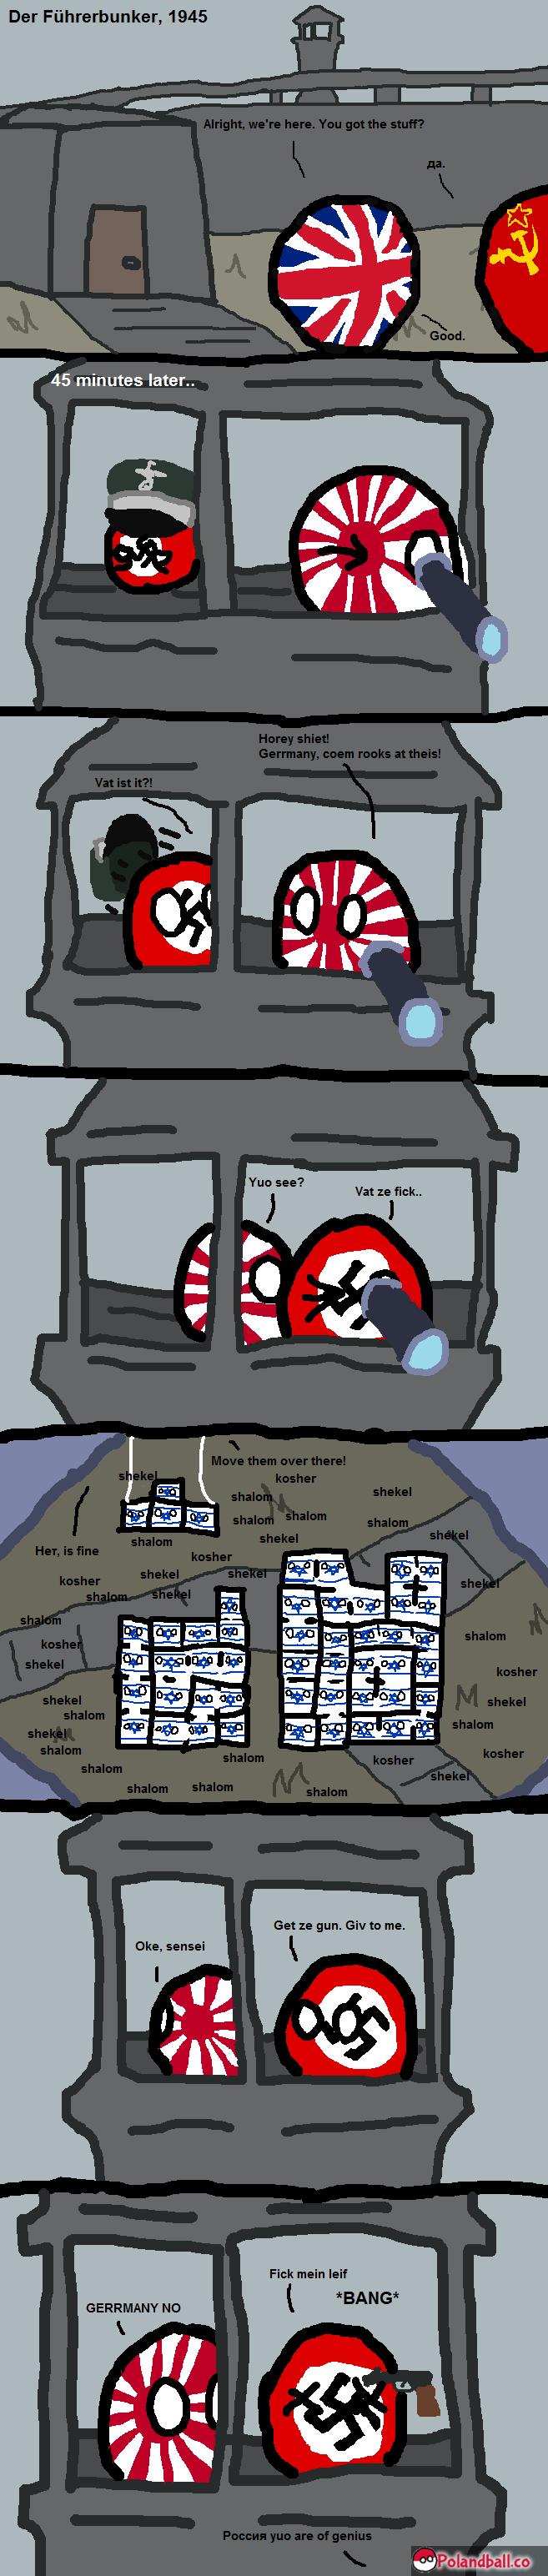 How World War II was really won. Source:www.polandball.co. 51 my ; my my